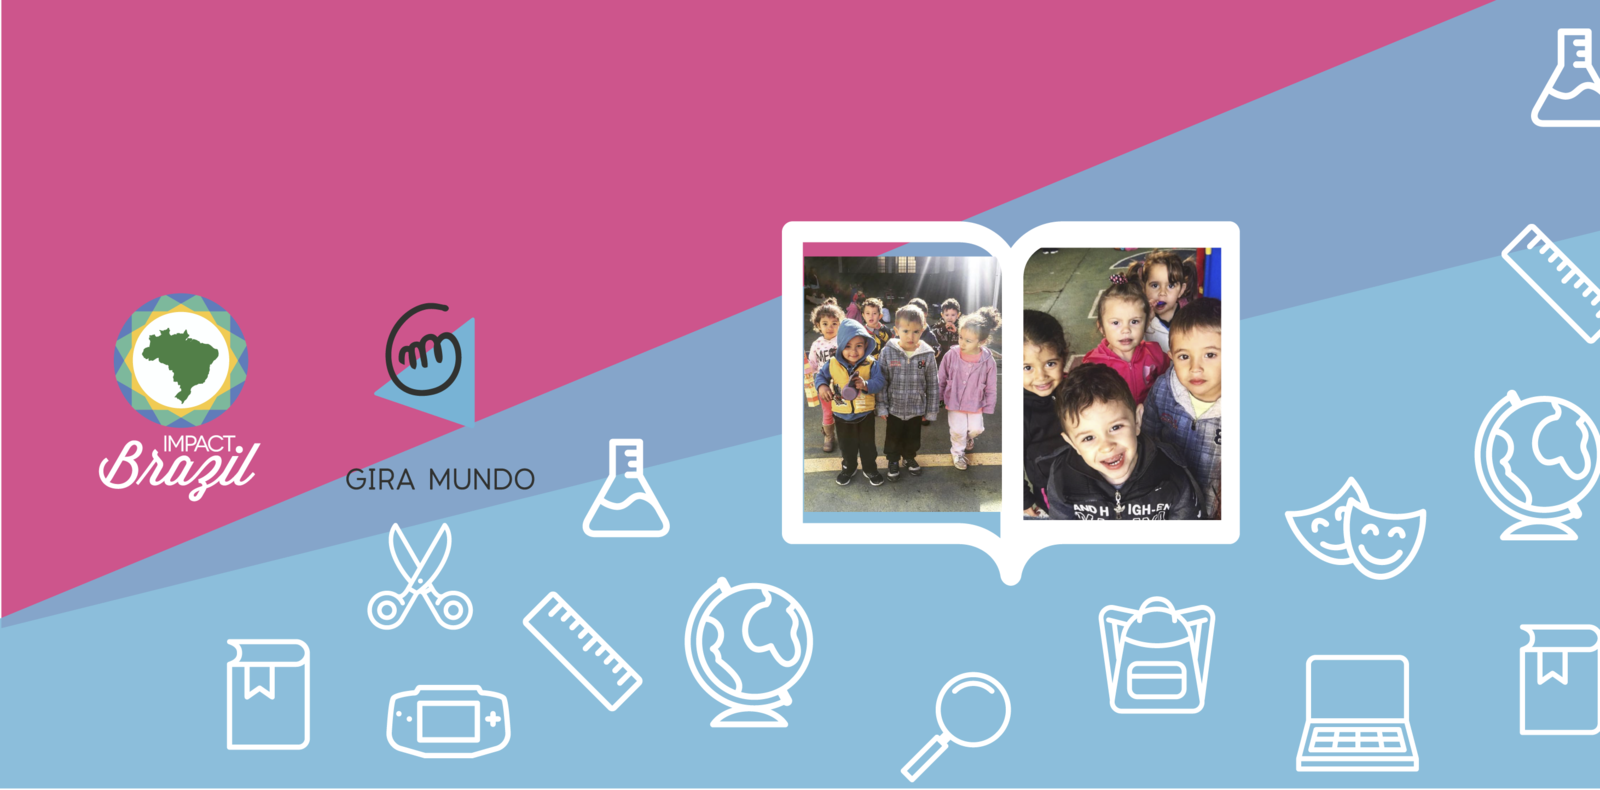 Gira Mundo - Working for quality education in São Carlos